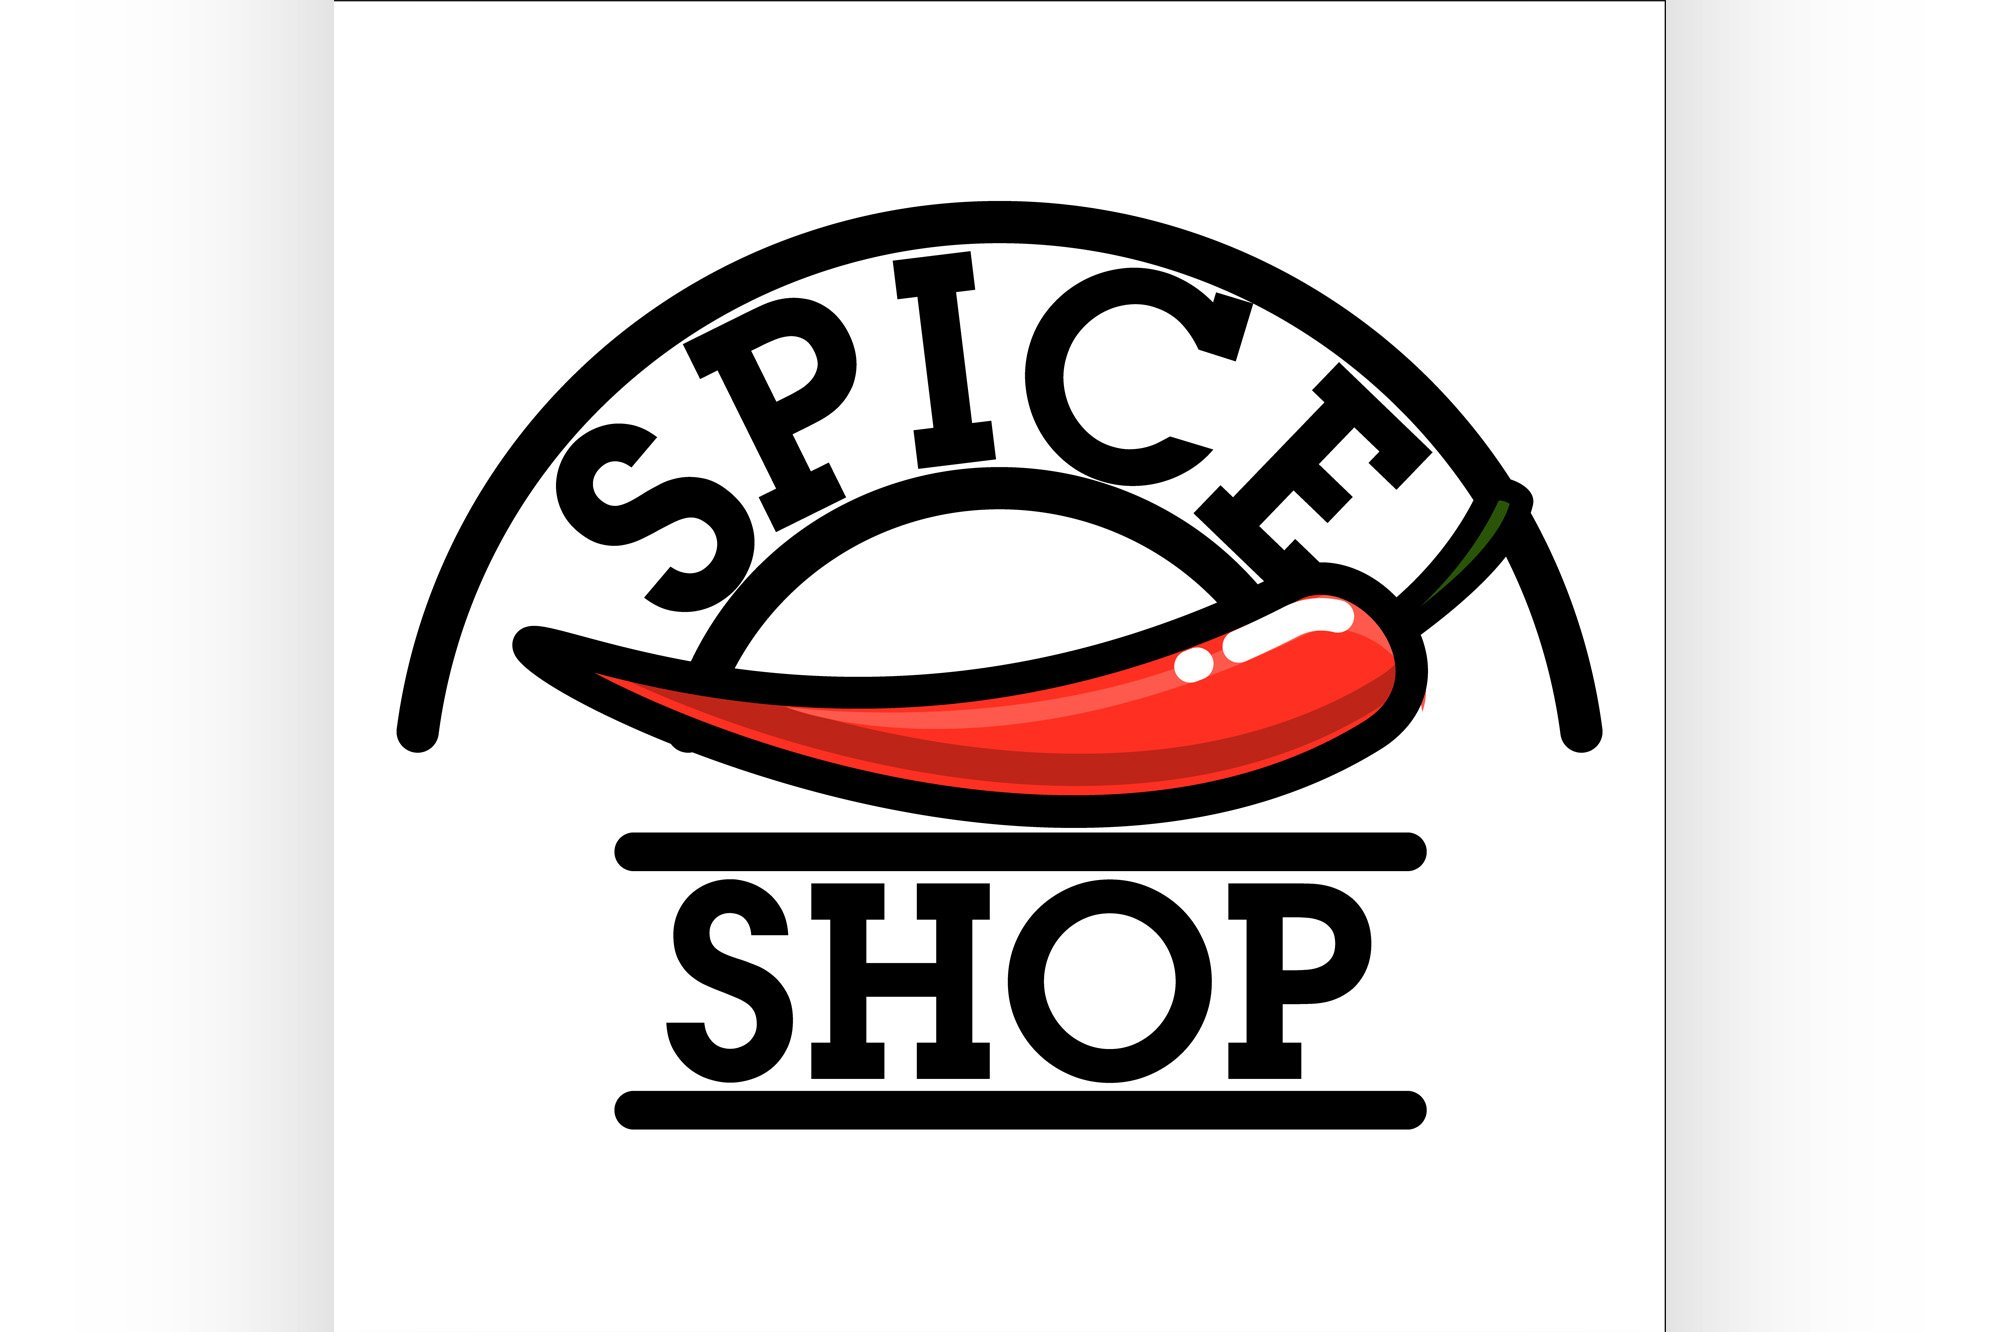 Color vintage spice shop emblem example image 1